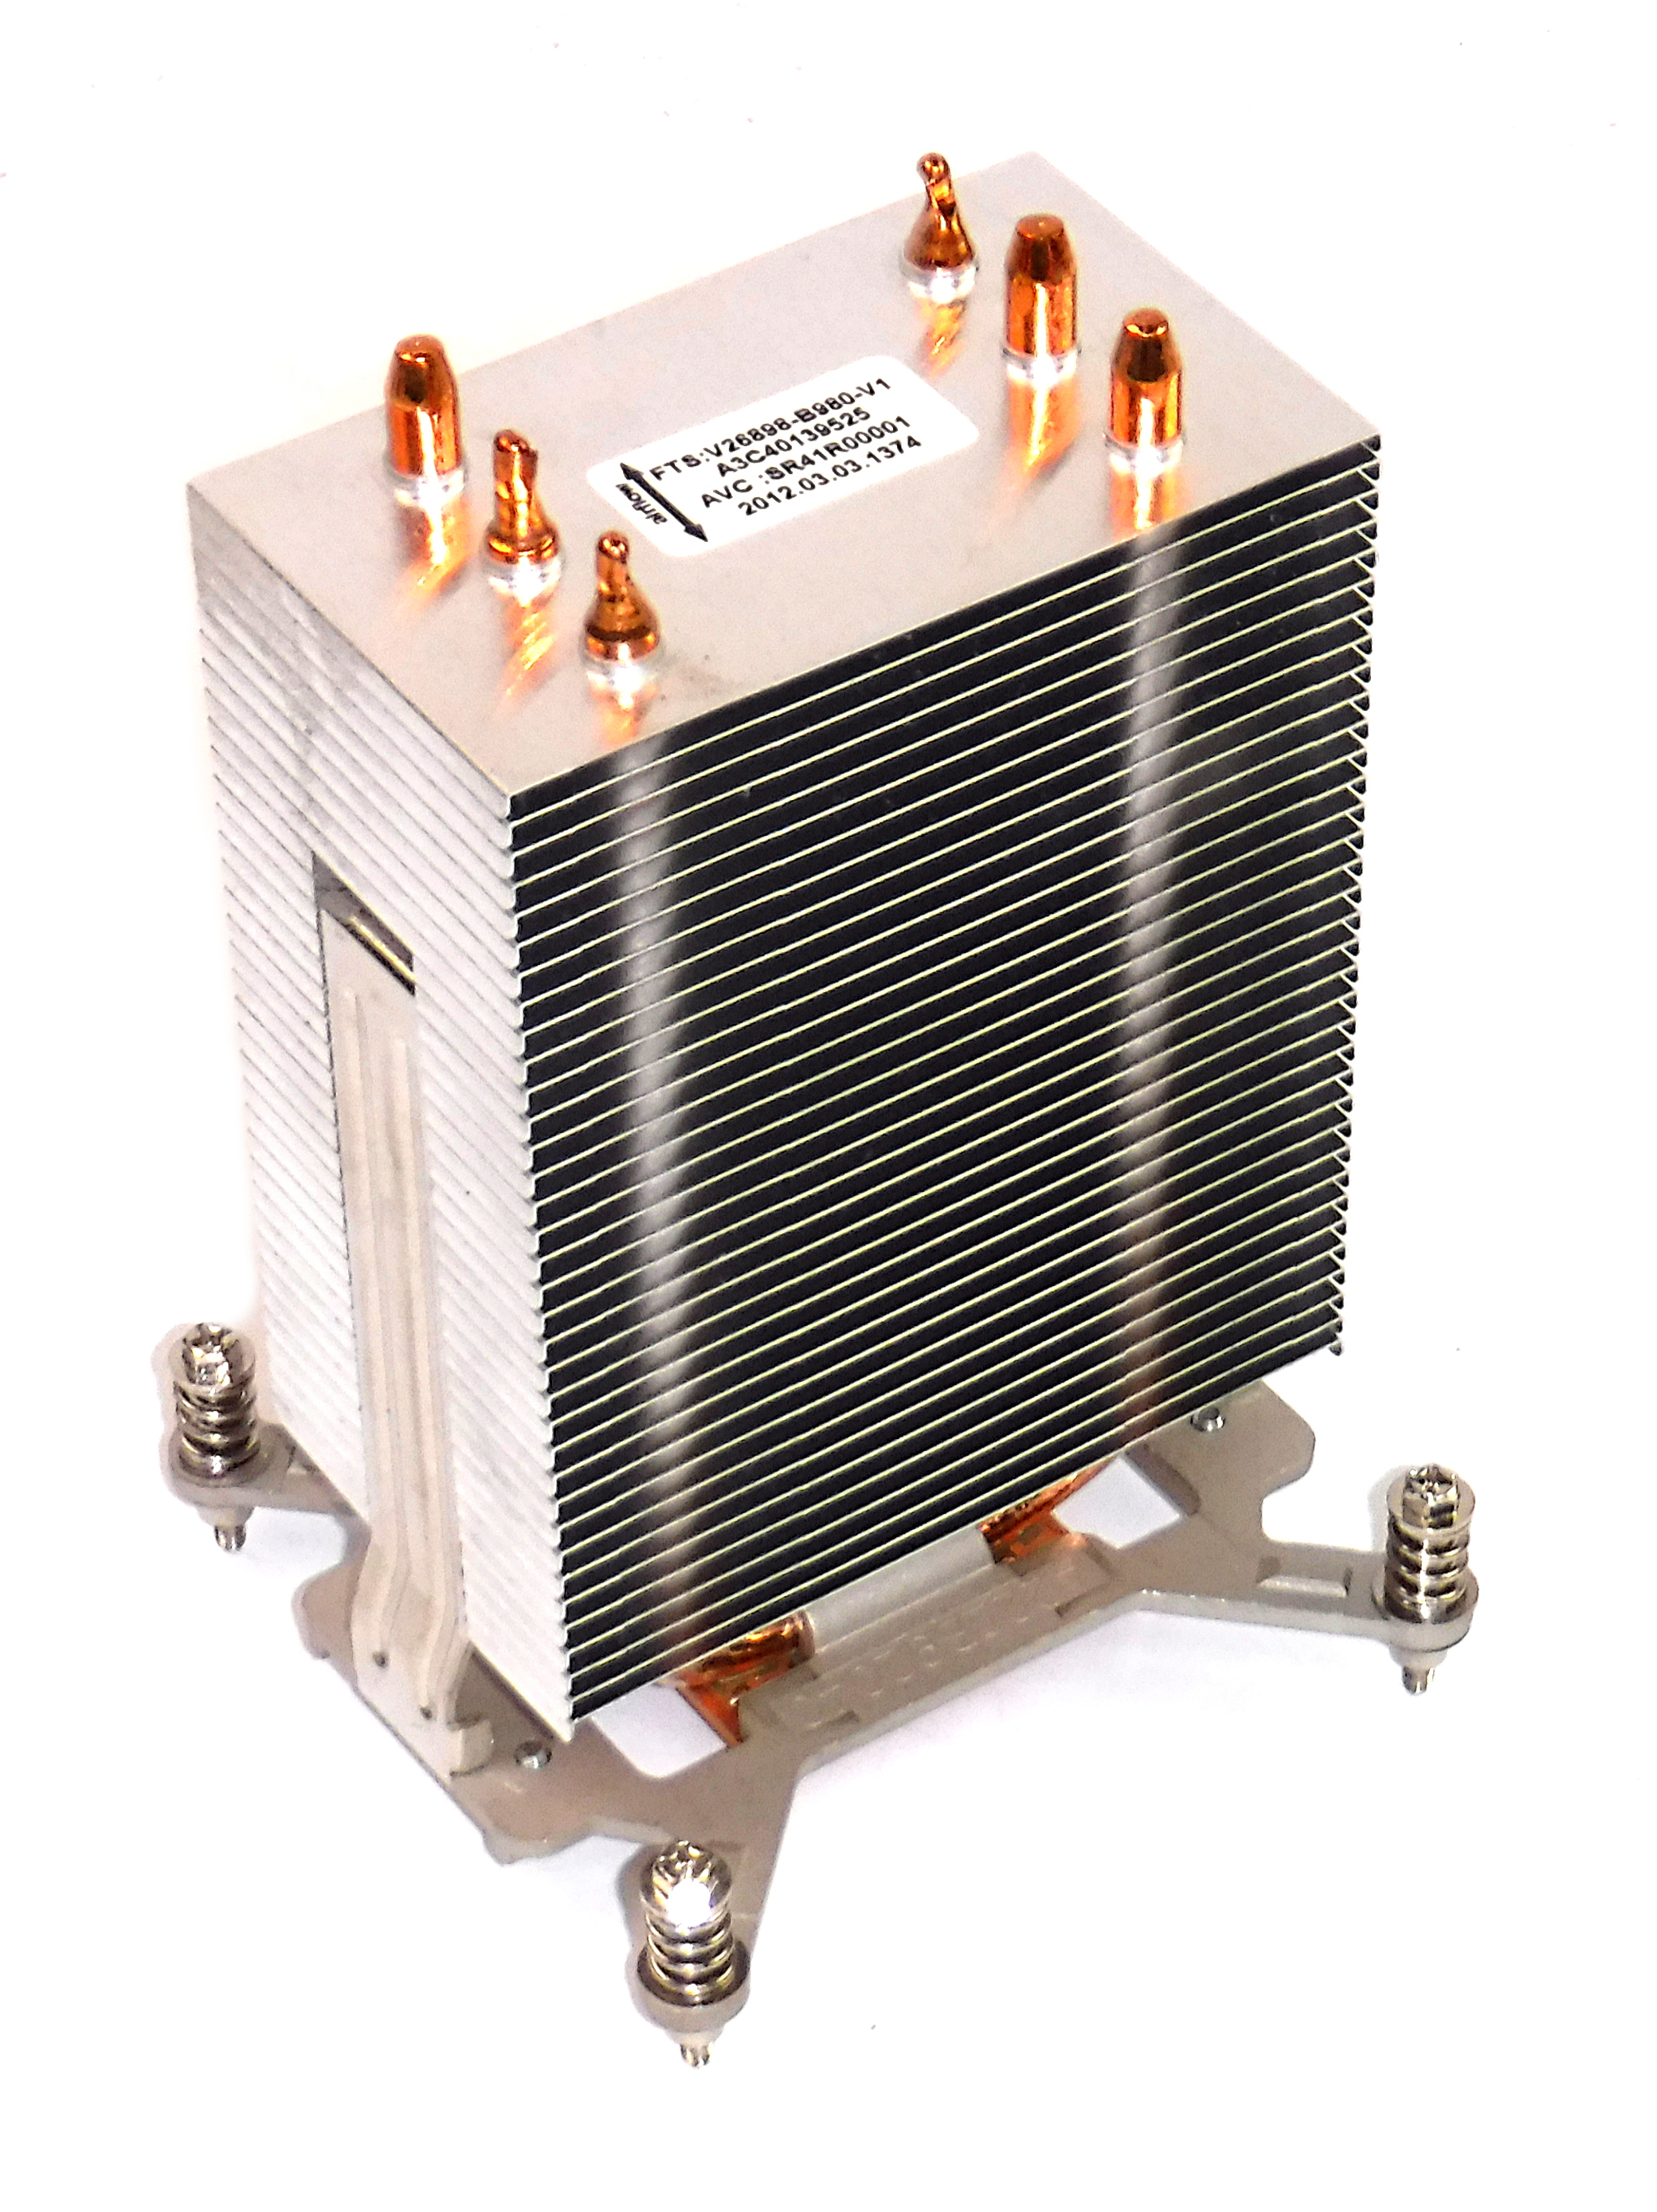 Fujitsu A3C40139525 CPU Heatsink For Primergy TX200 S7